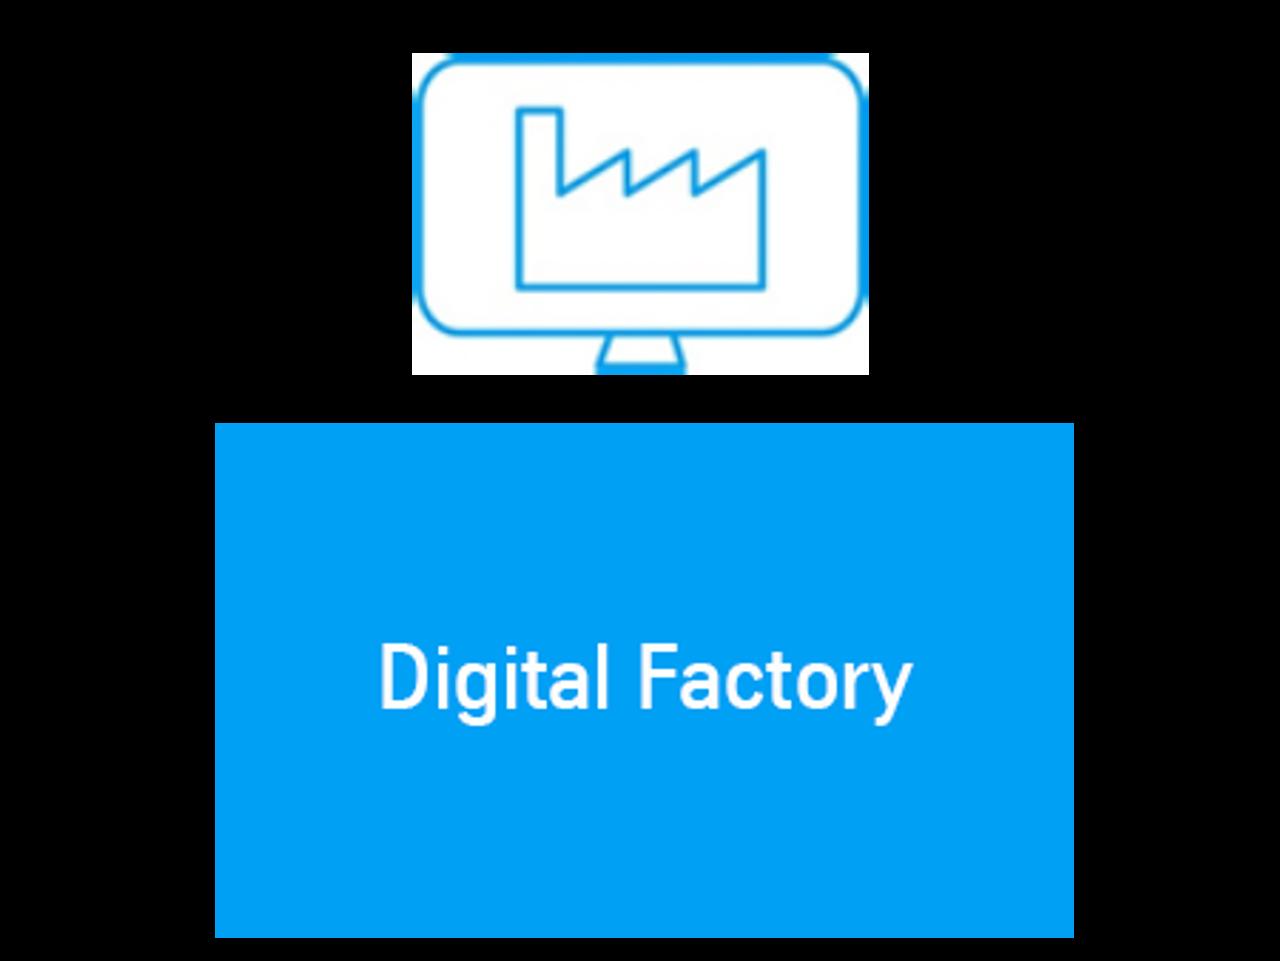 Digital Factory thyssenkrupp automation engineering